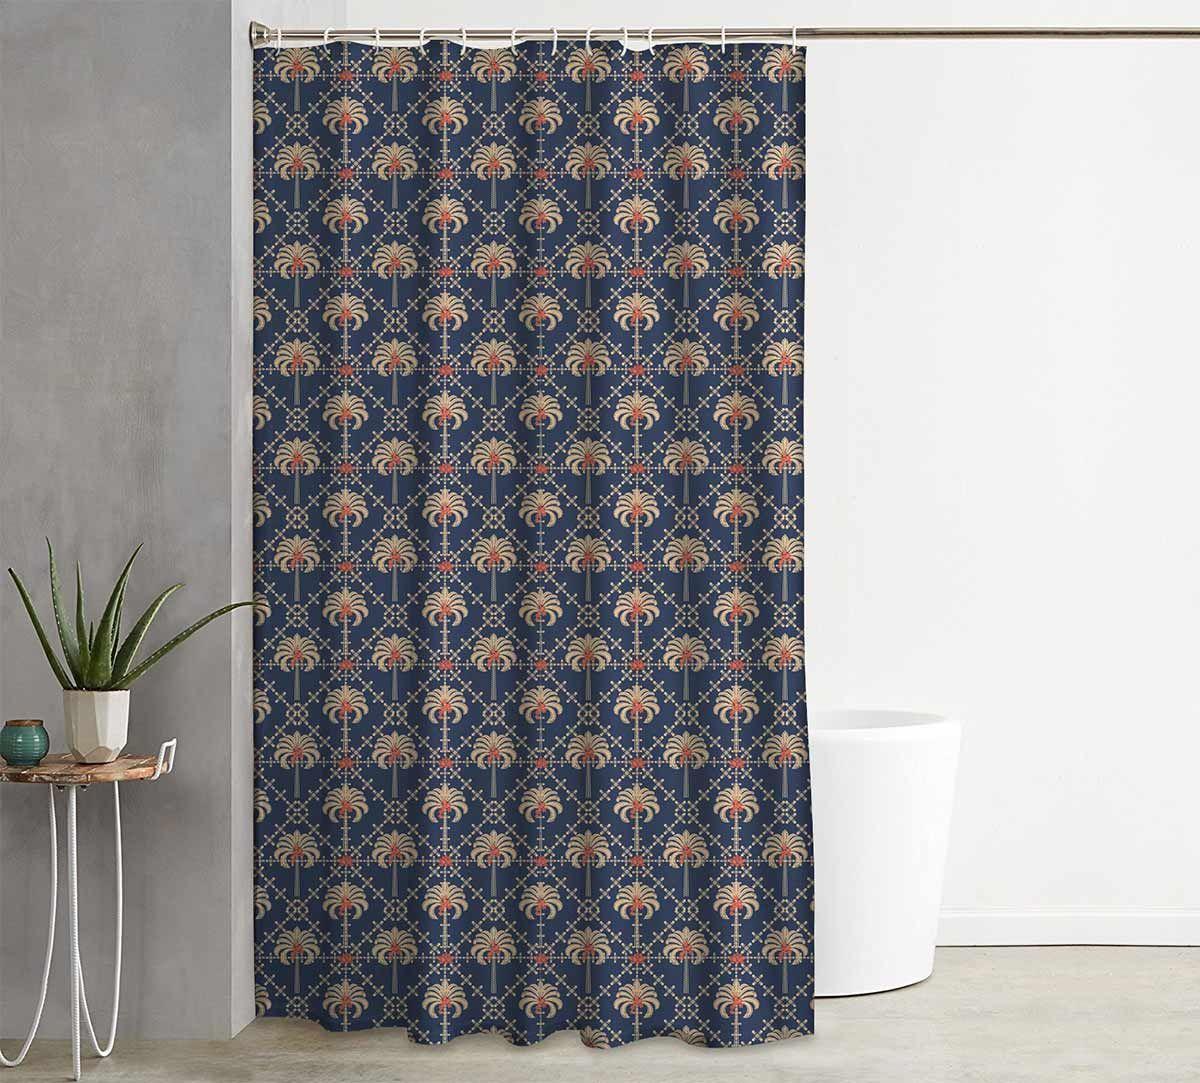 Buy designer shower curtains online | indiacircus.com